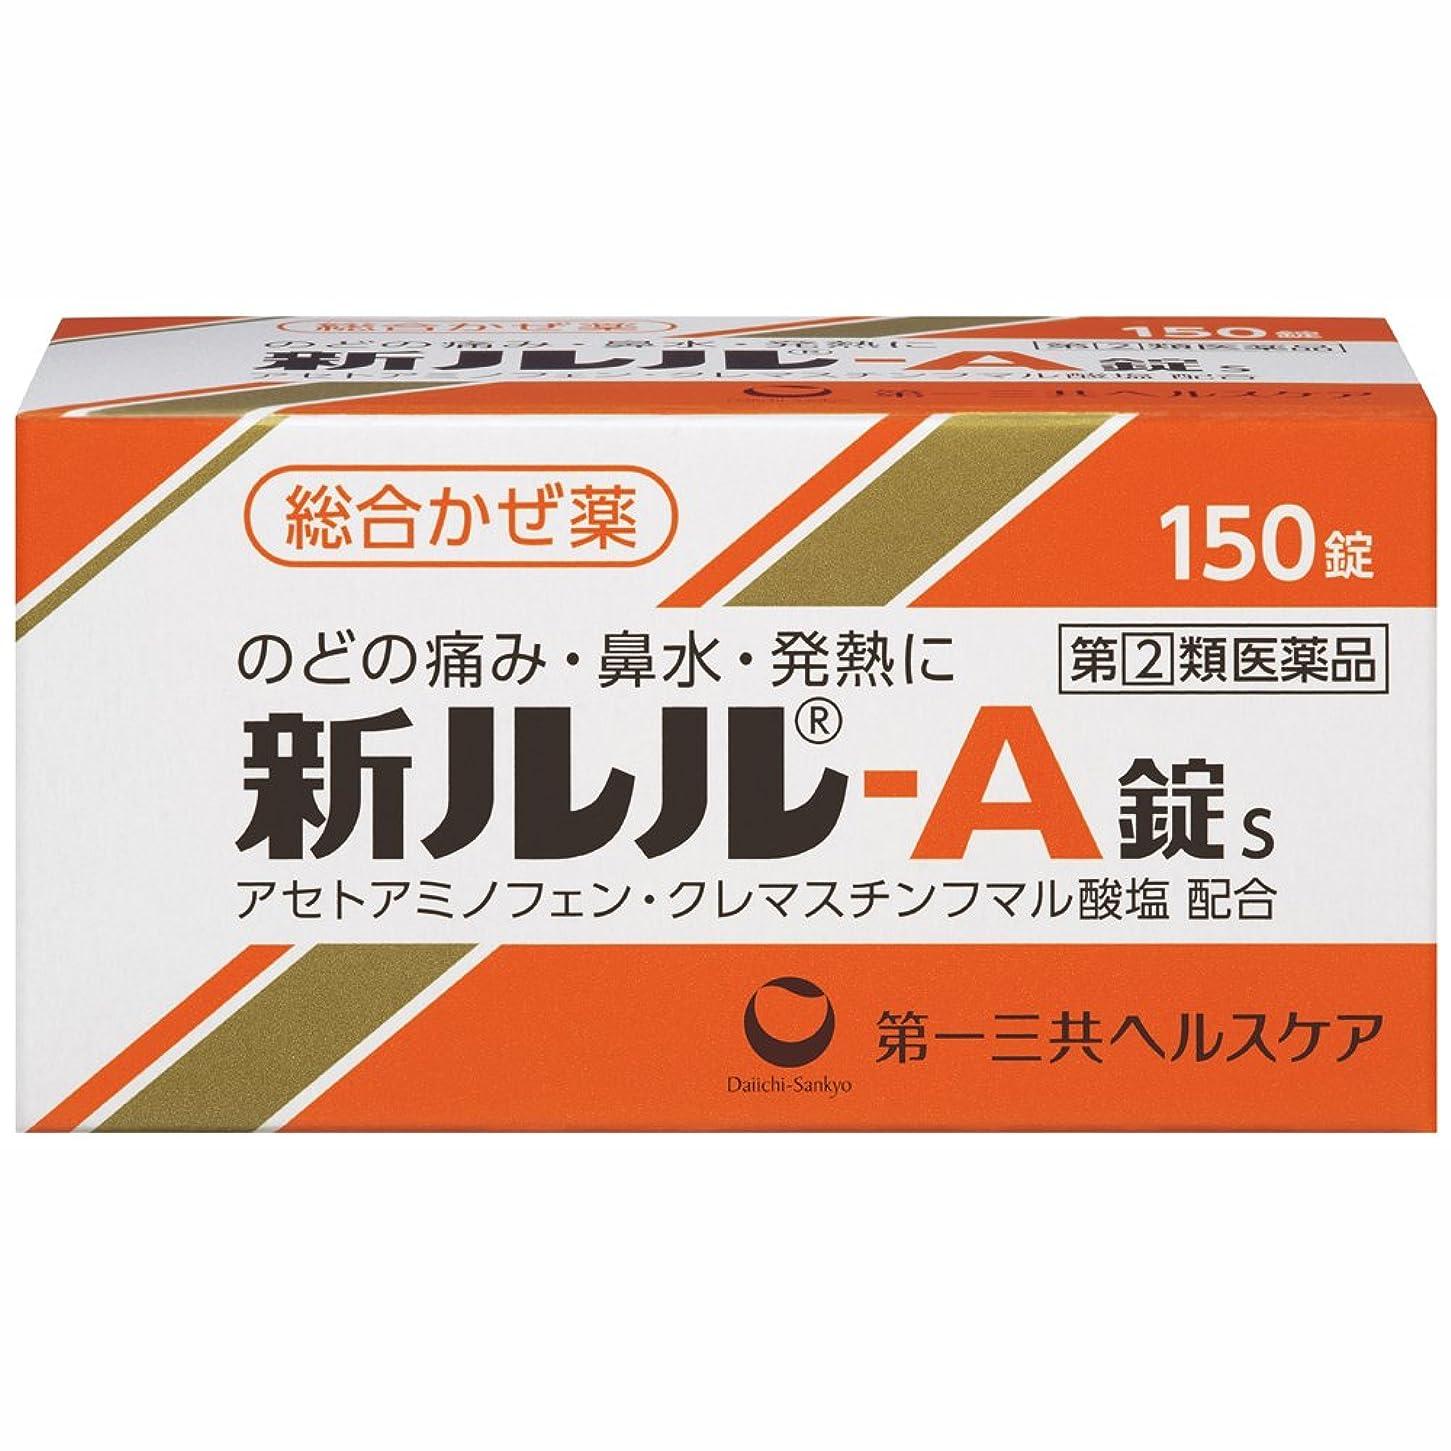 移民レガシー軍艦【指定第2類医薬品】新ルル-A錠s 150錠